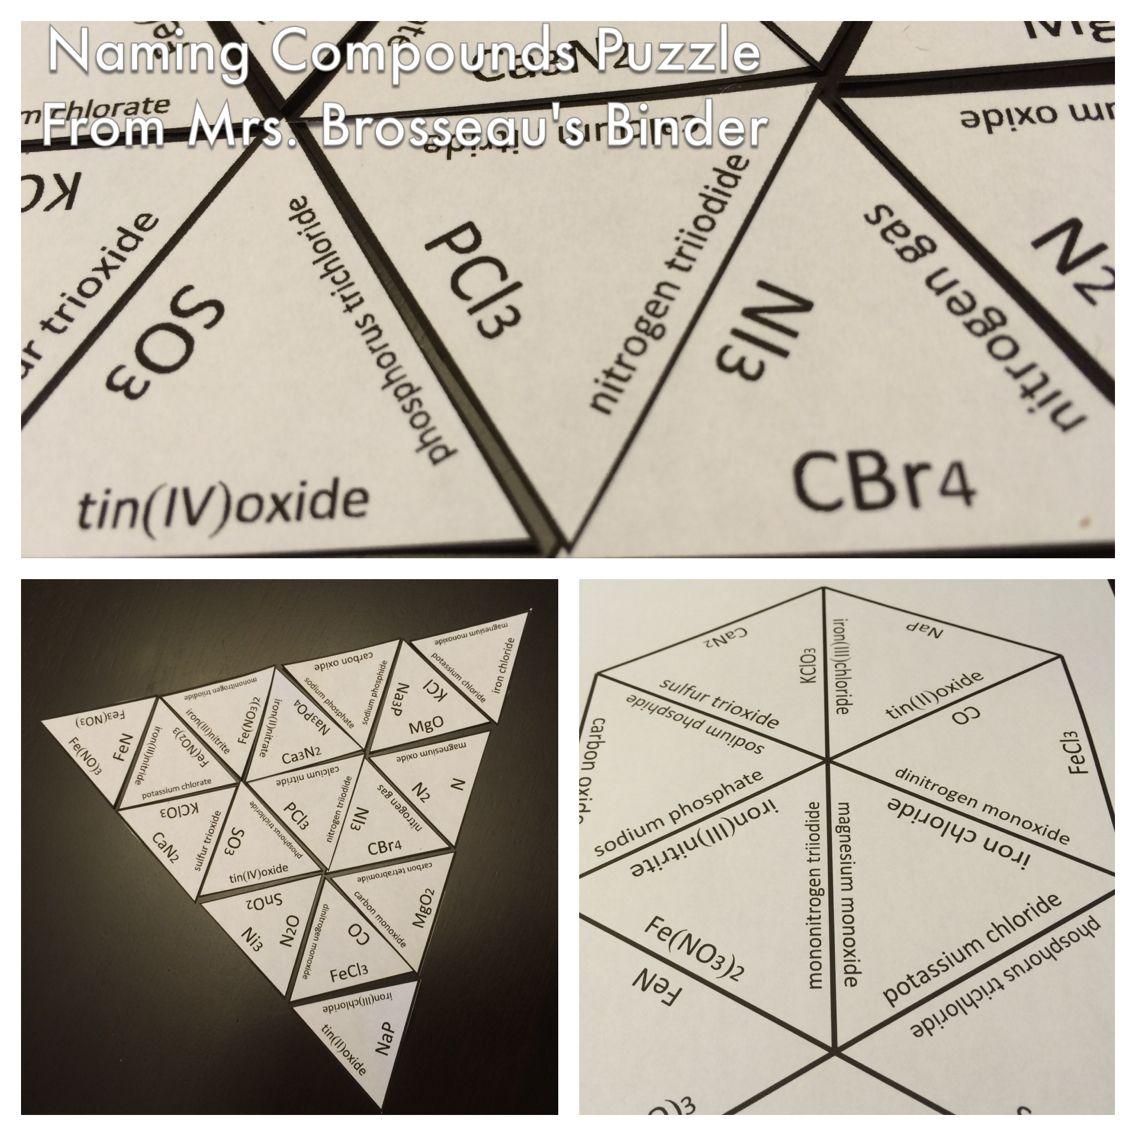 Naming Compounds Puzzle